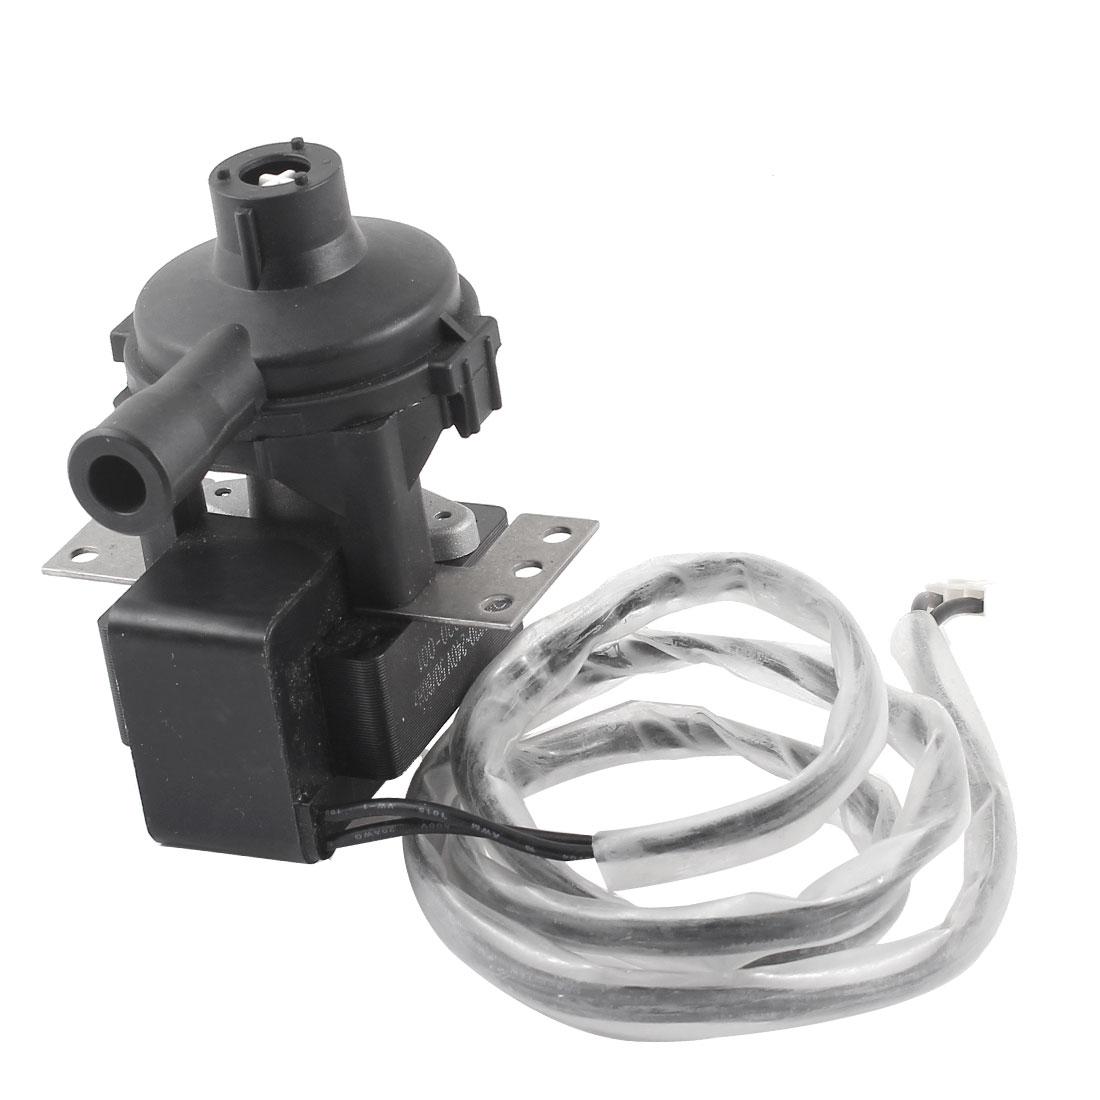 Universal Refrigerator Fridge Air-condition Water Pump Motor AC220-240V